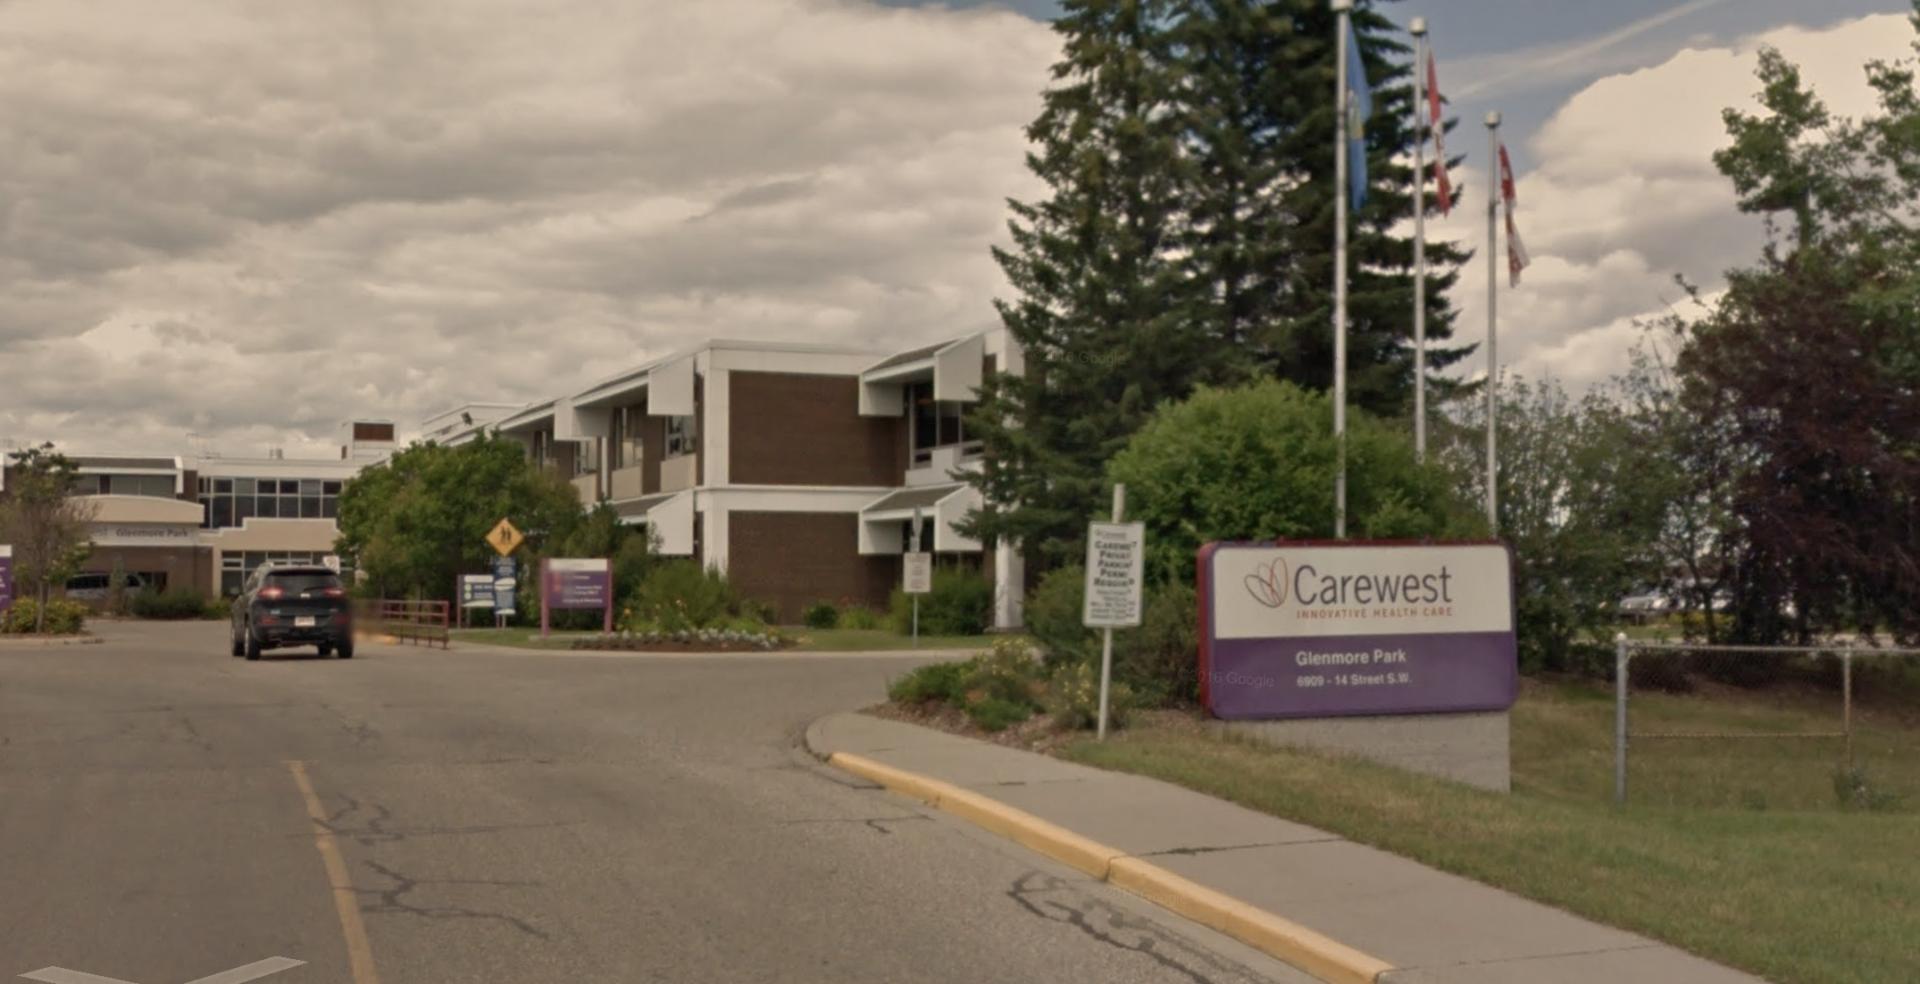 New coronavirus outbreak detected in YYC's Carewest Glenmore Park